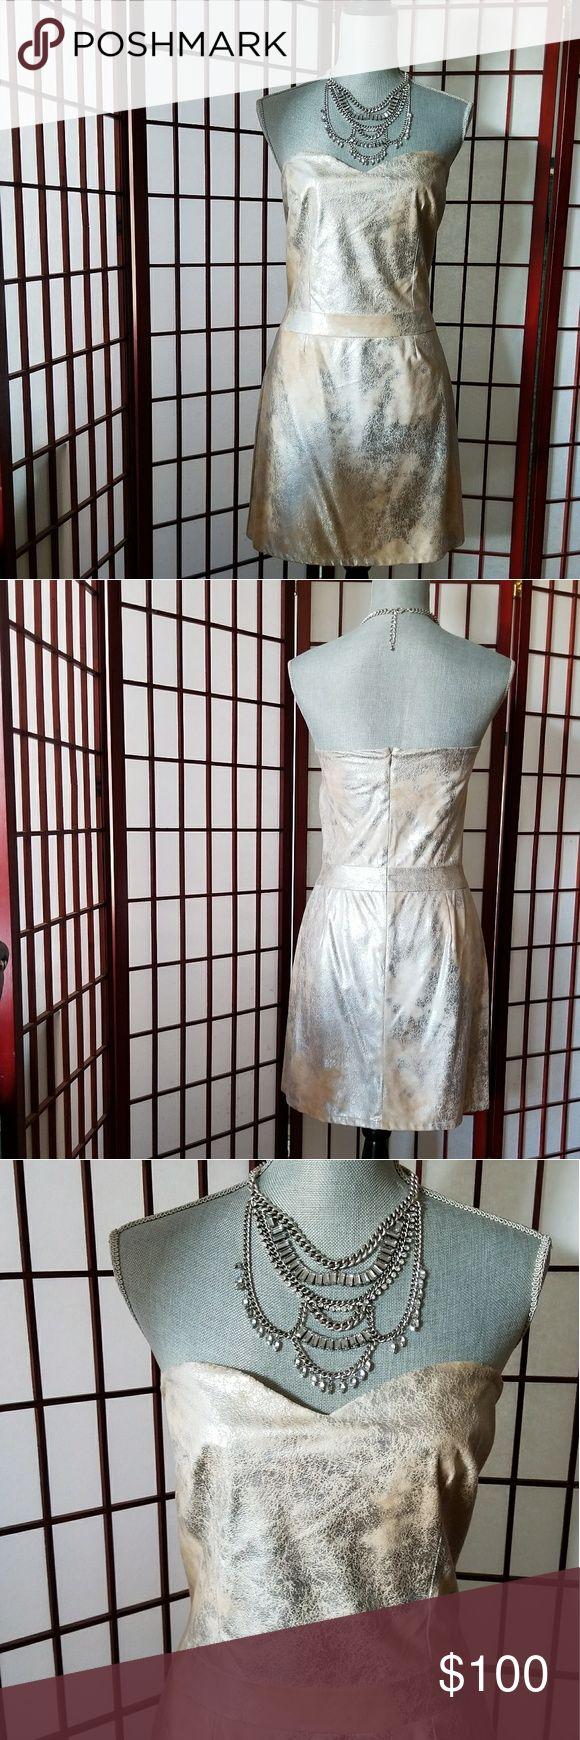 Silk metallic mini dress Silk metallic strapless mini dress. Cracked silver pattern on dress picks up light beautifully. Aaron Ashe Dresses Strapless